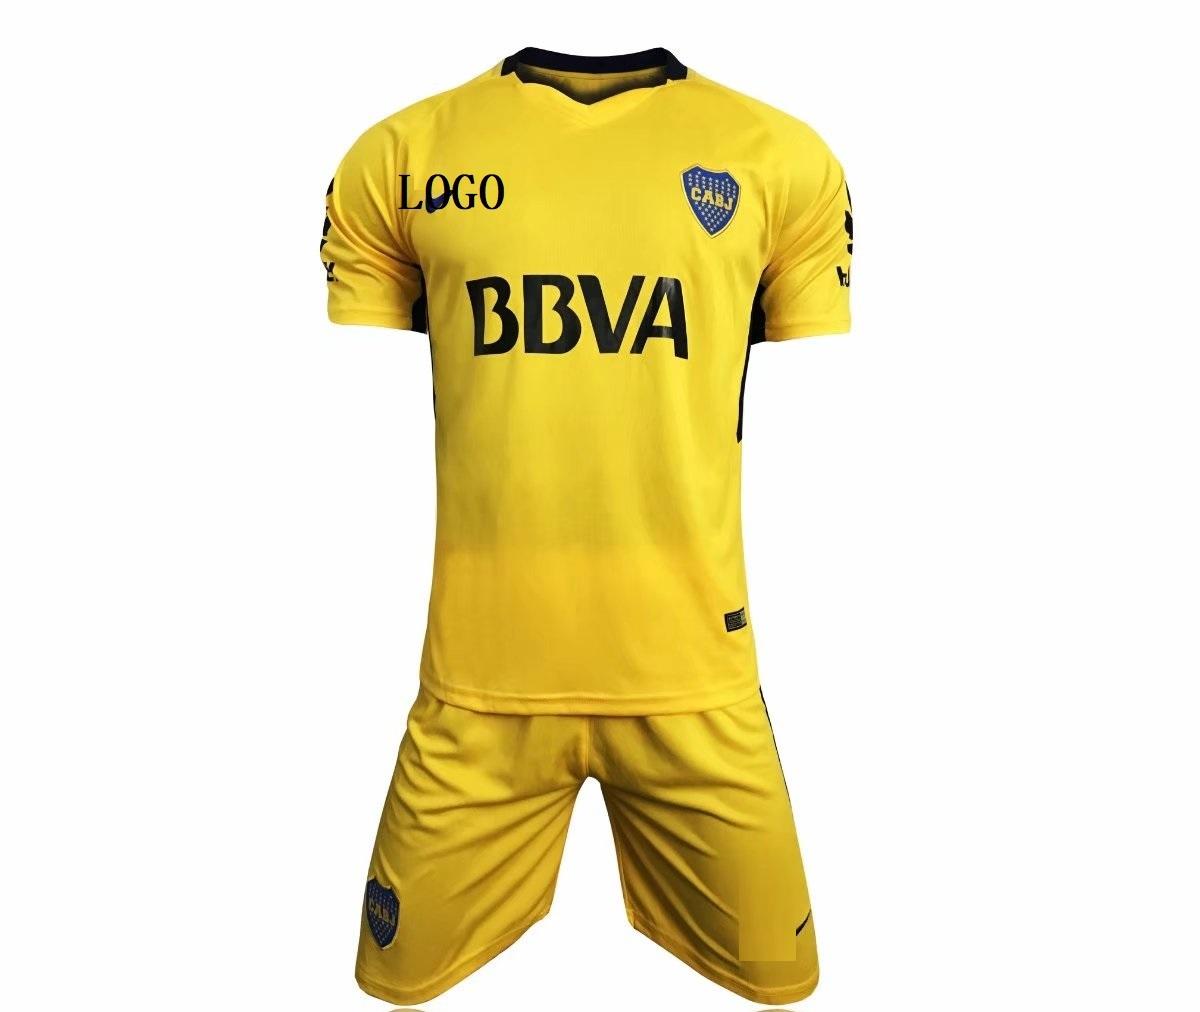 finest selection 5782a e46e4 2017/2018 Boca Juniors away Soccer kits Yellow Soccer Jersey Uniforms Cheap  Adult Football Uniform Kits